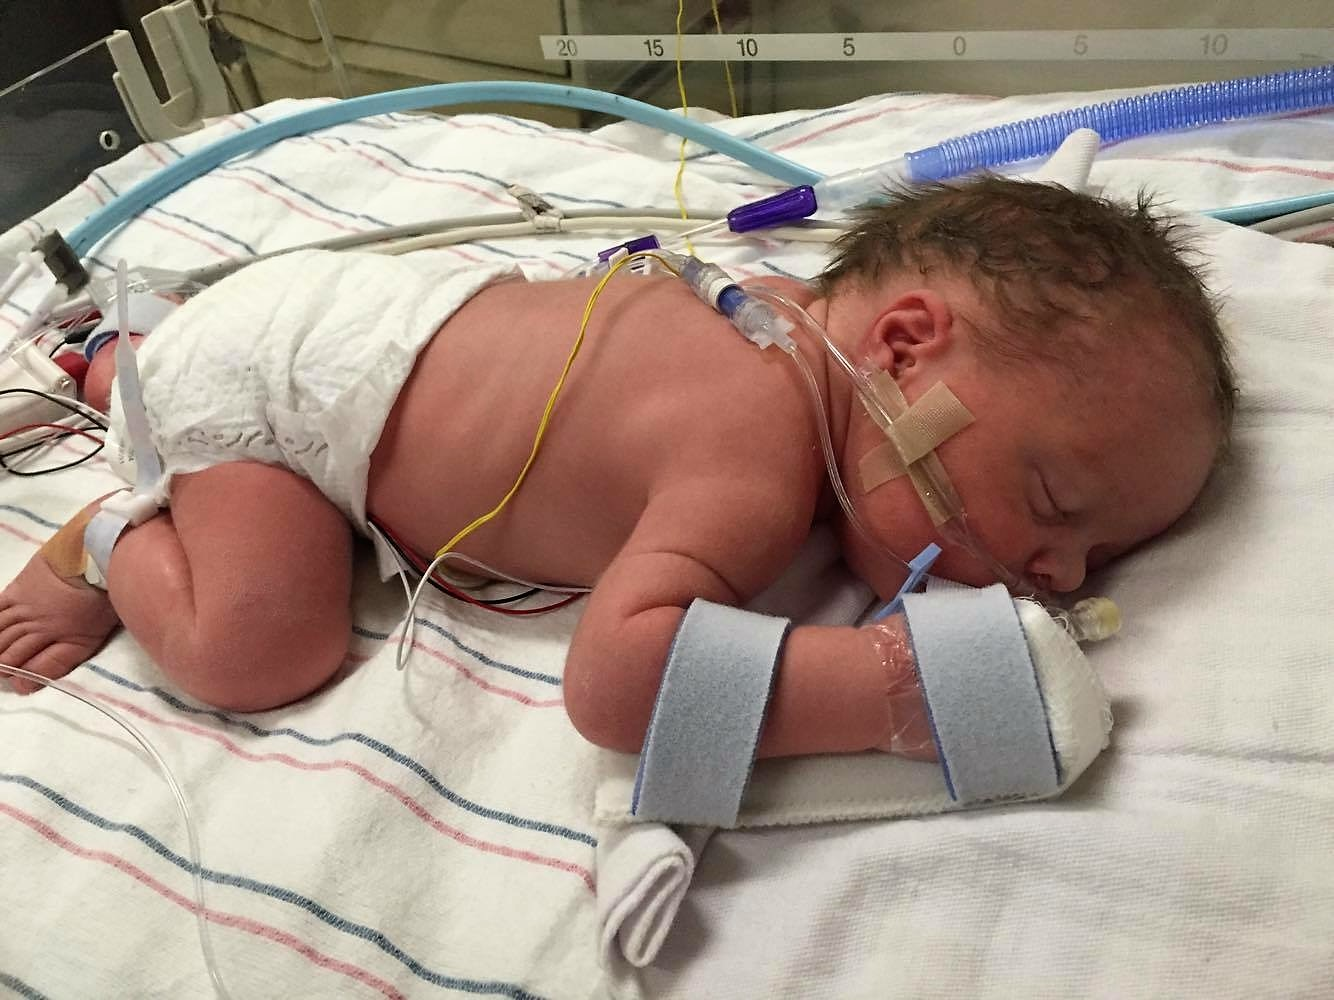 newborn in hospital bed